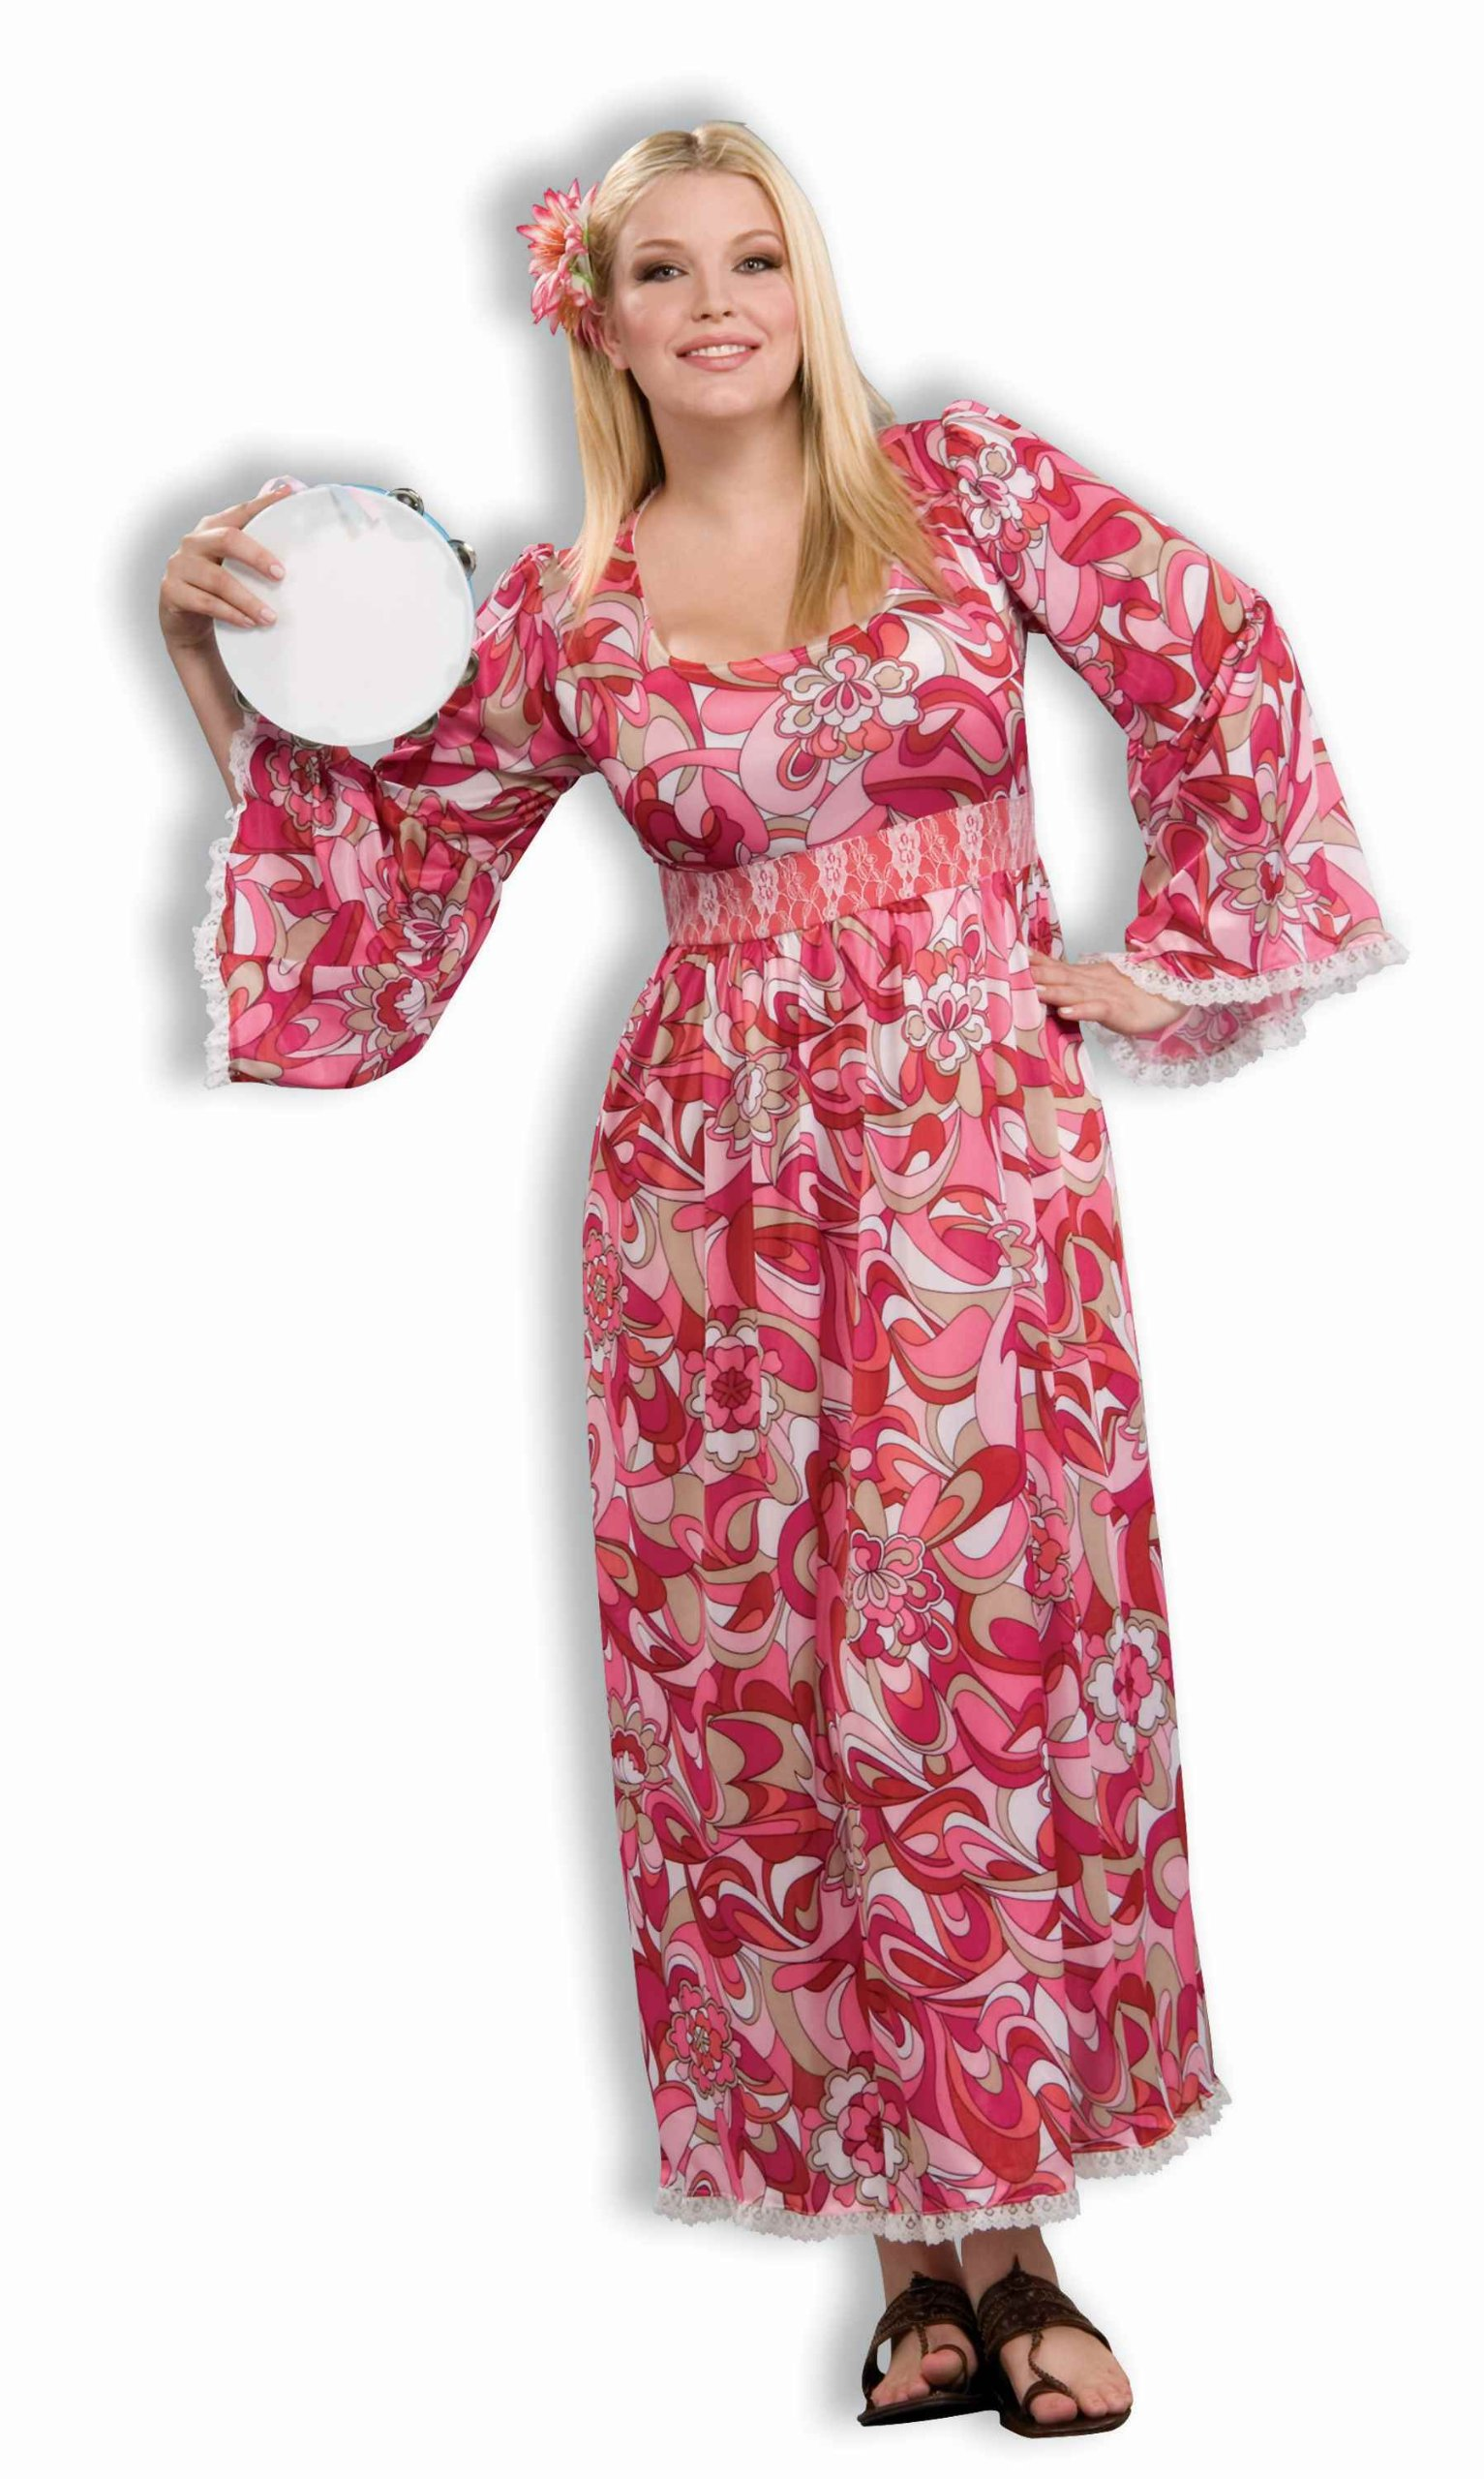 Forum Novelties Women's Plus-Size Flower Child Costume Dress, Pink/White, Plus by Forum Novelties